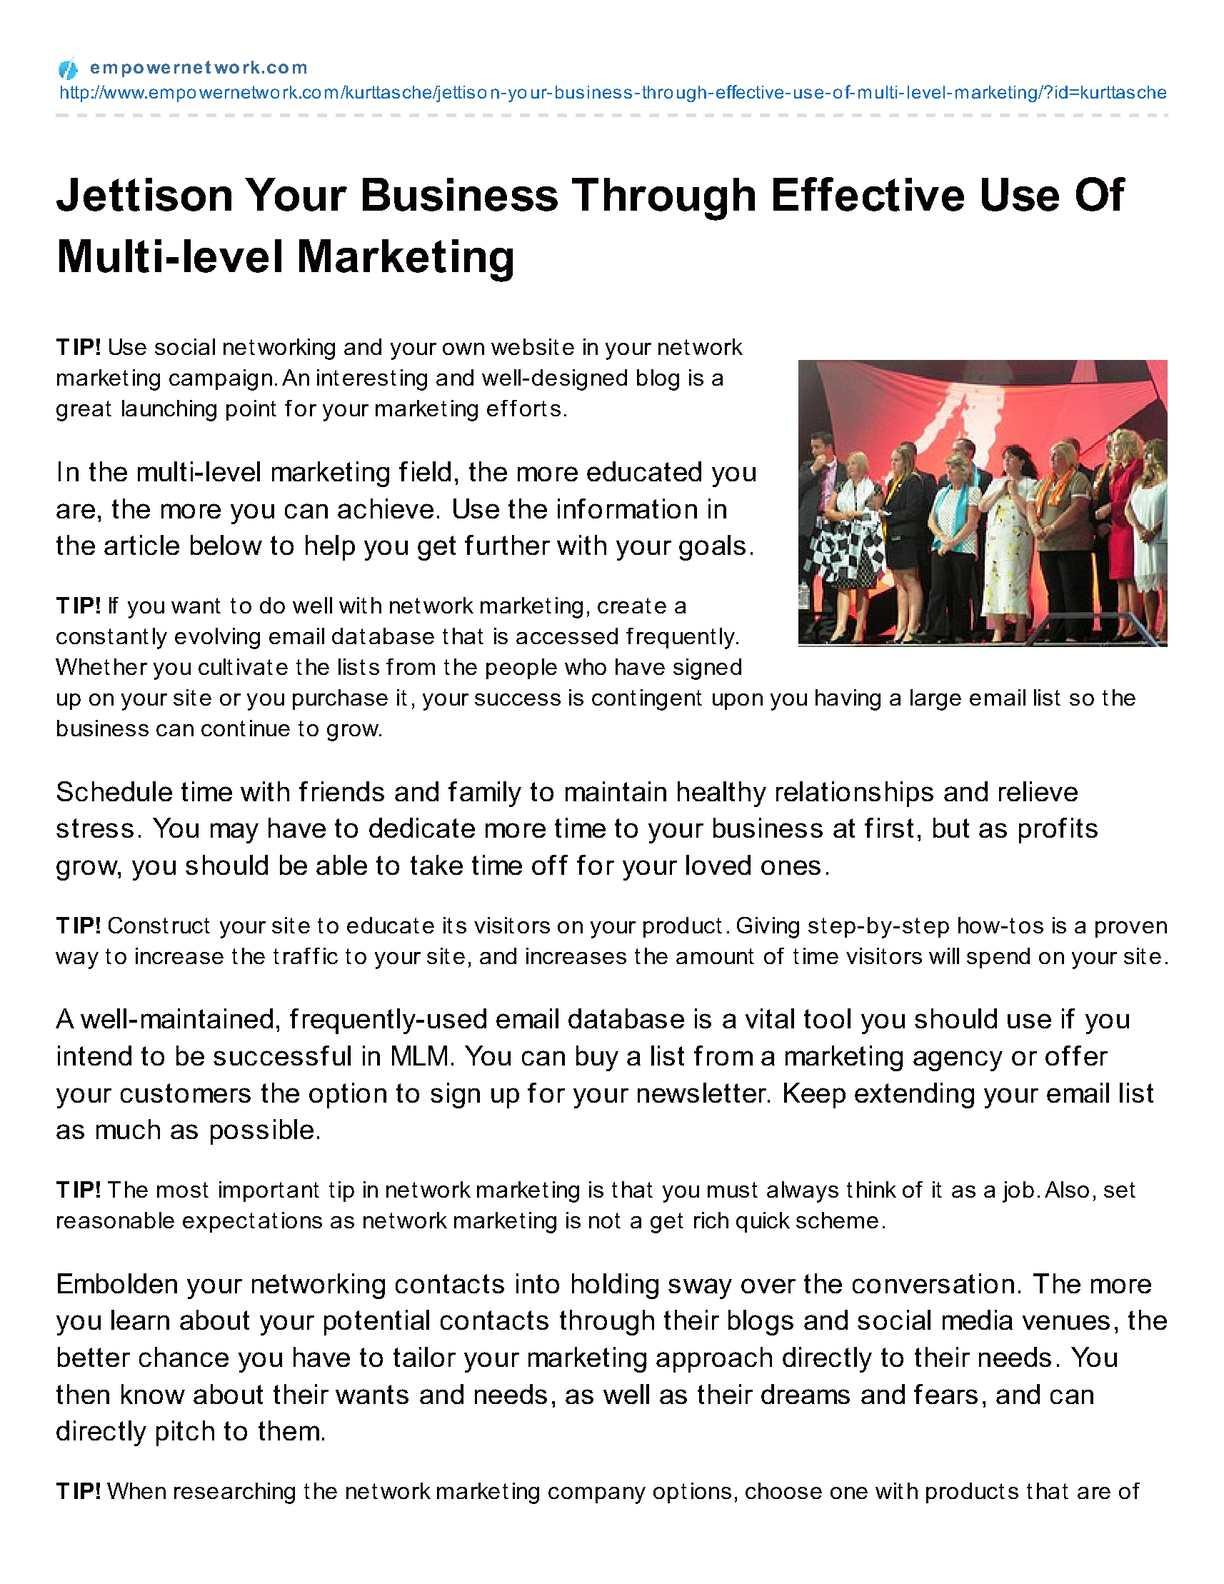 marketing creates needs and wants